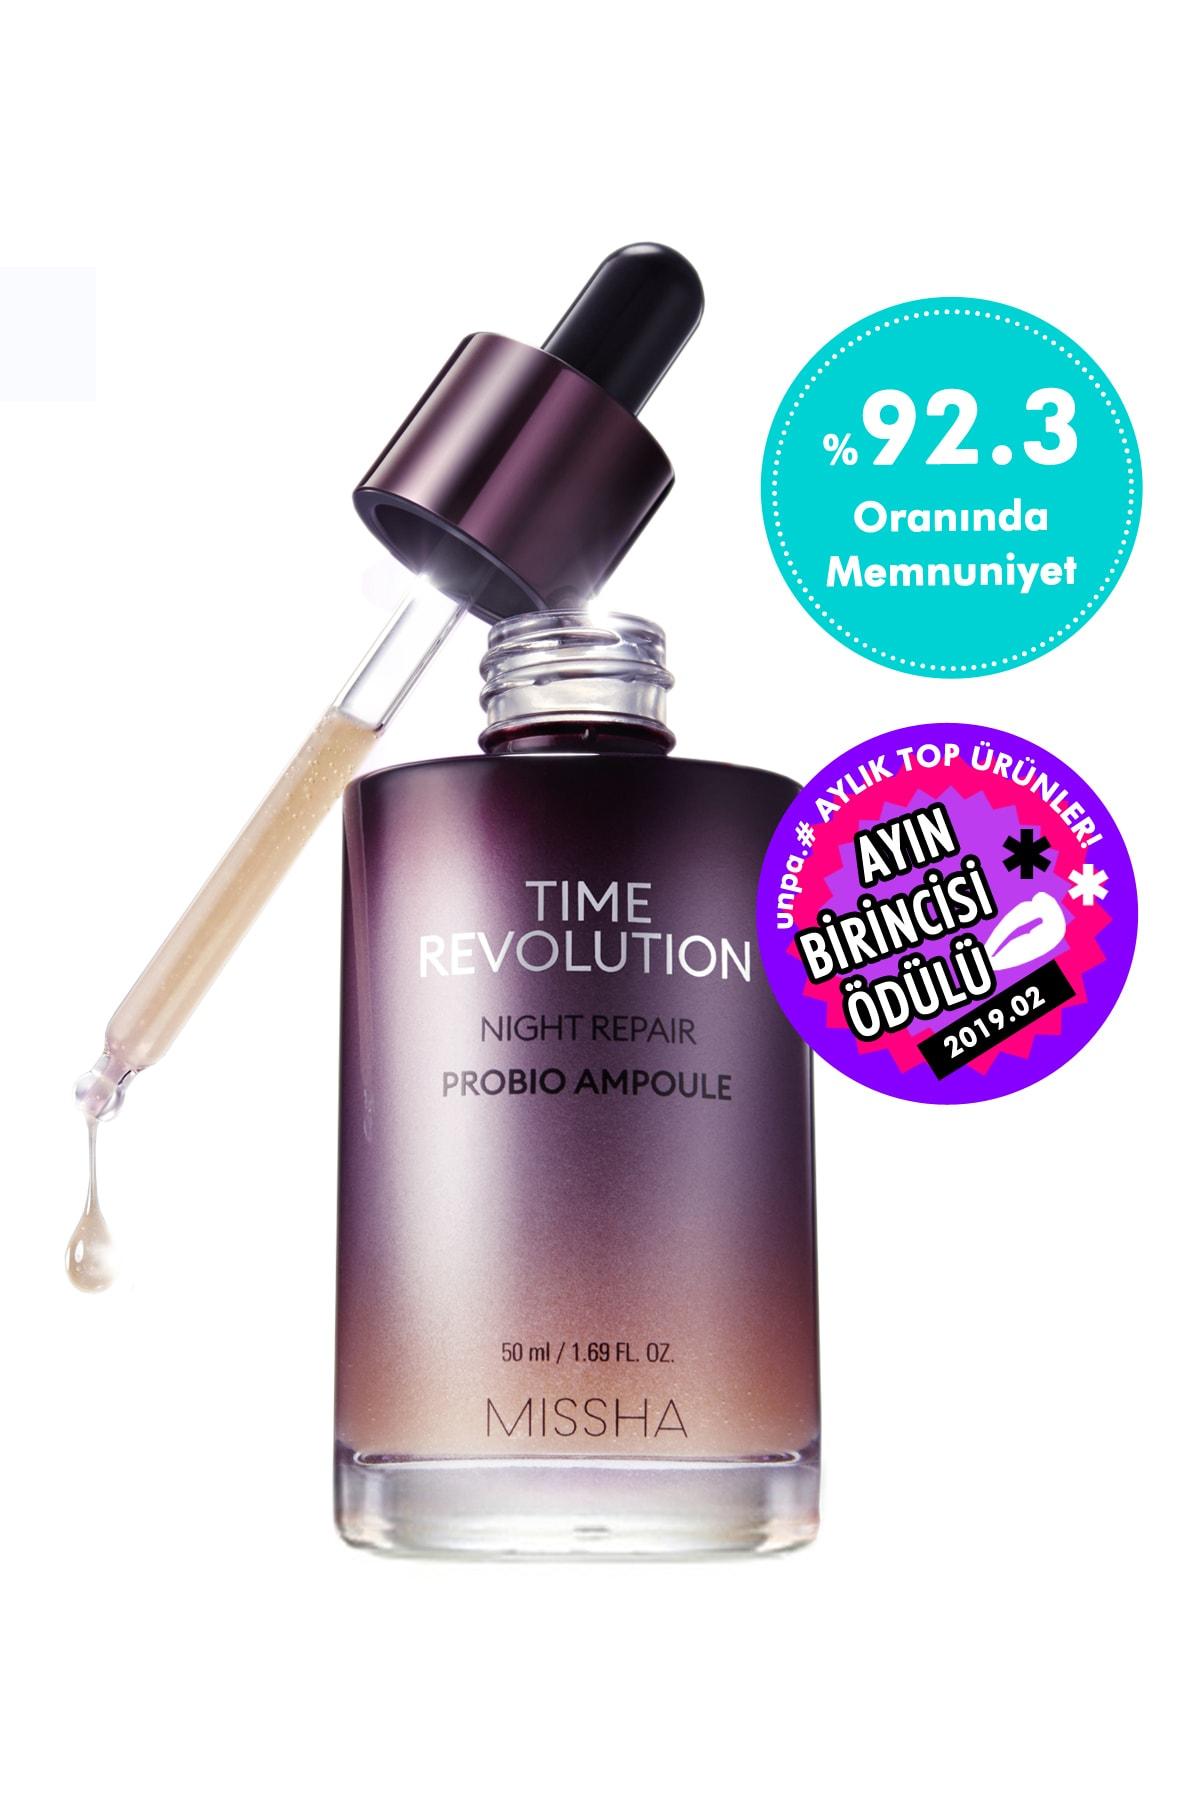 Missha Yaşlanma Karşıtı Probiyotik İçerikli Ampul 50ml Time Revolution Probio Ampoule